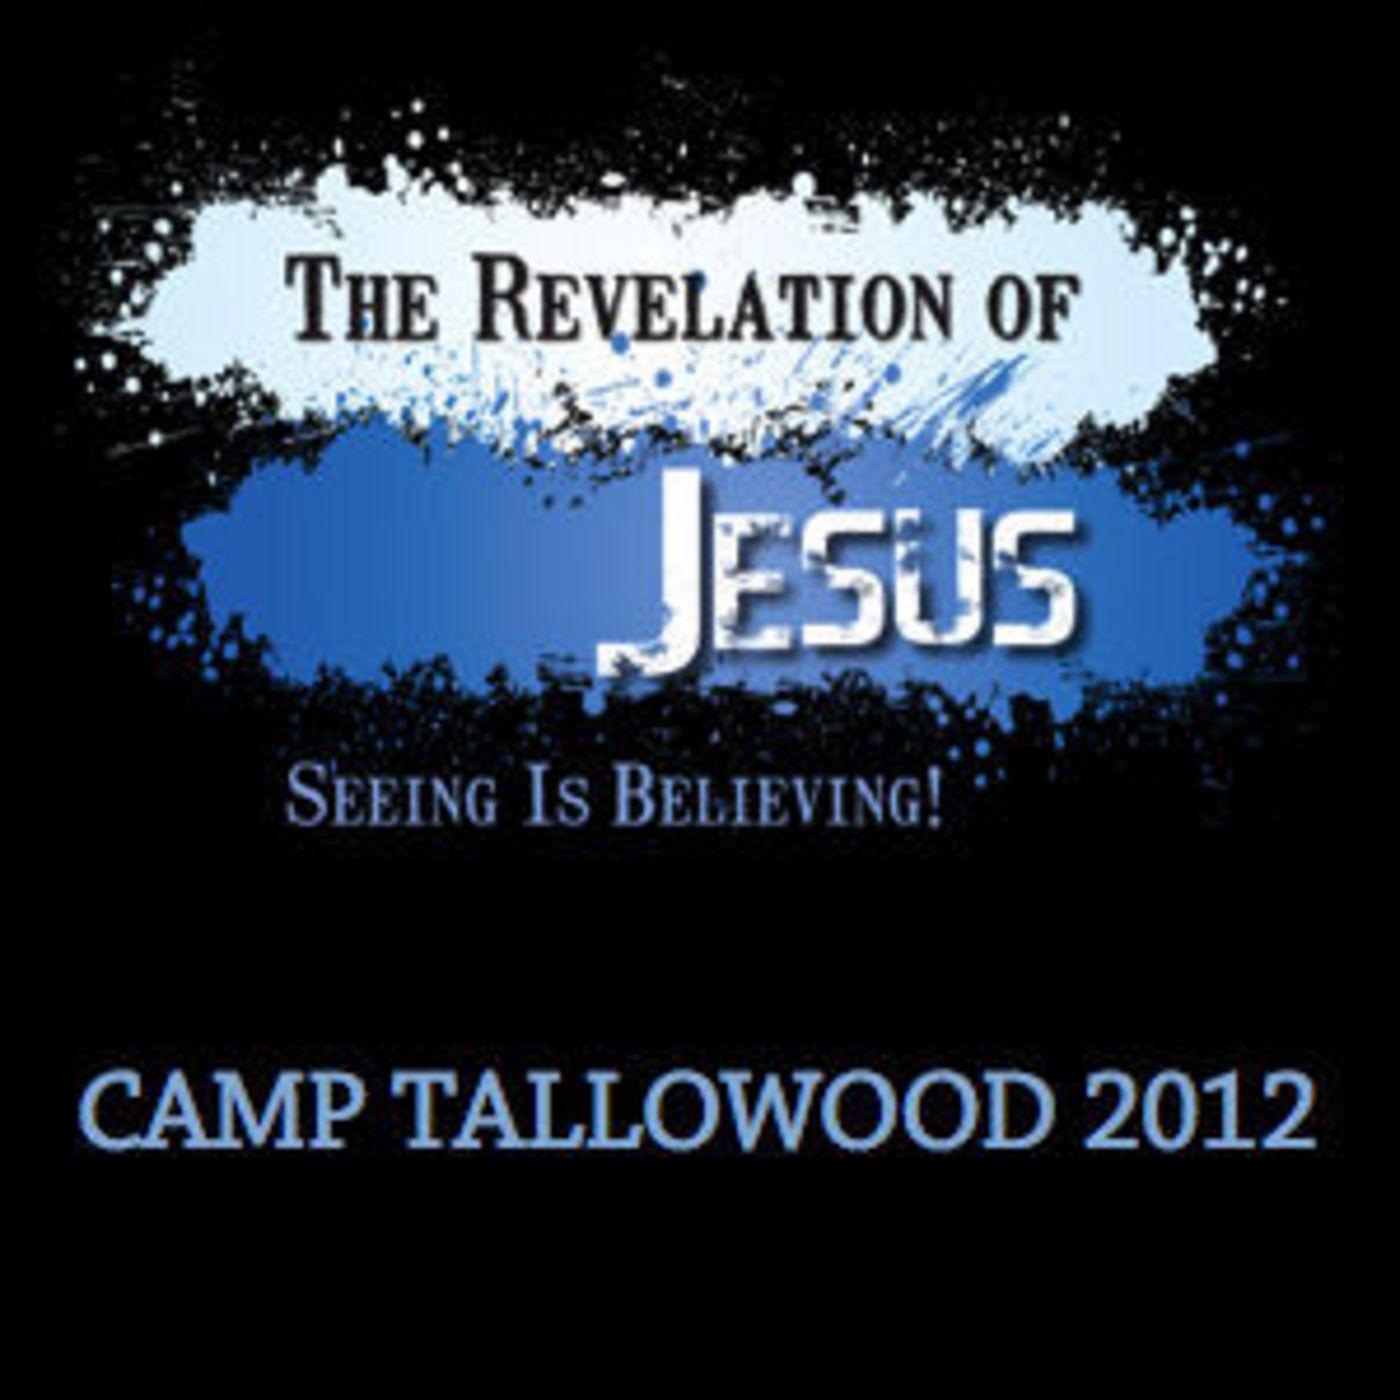 <![CDATA[Camp Tallowood 2012]]>